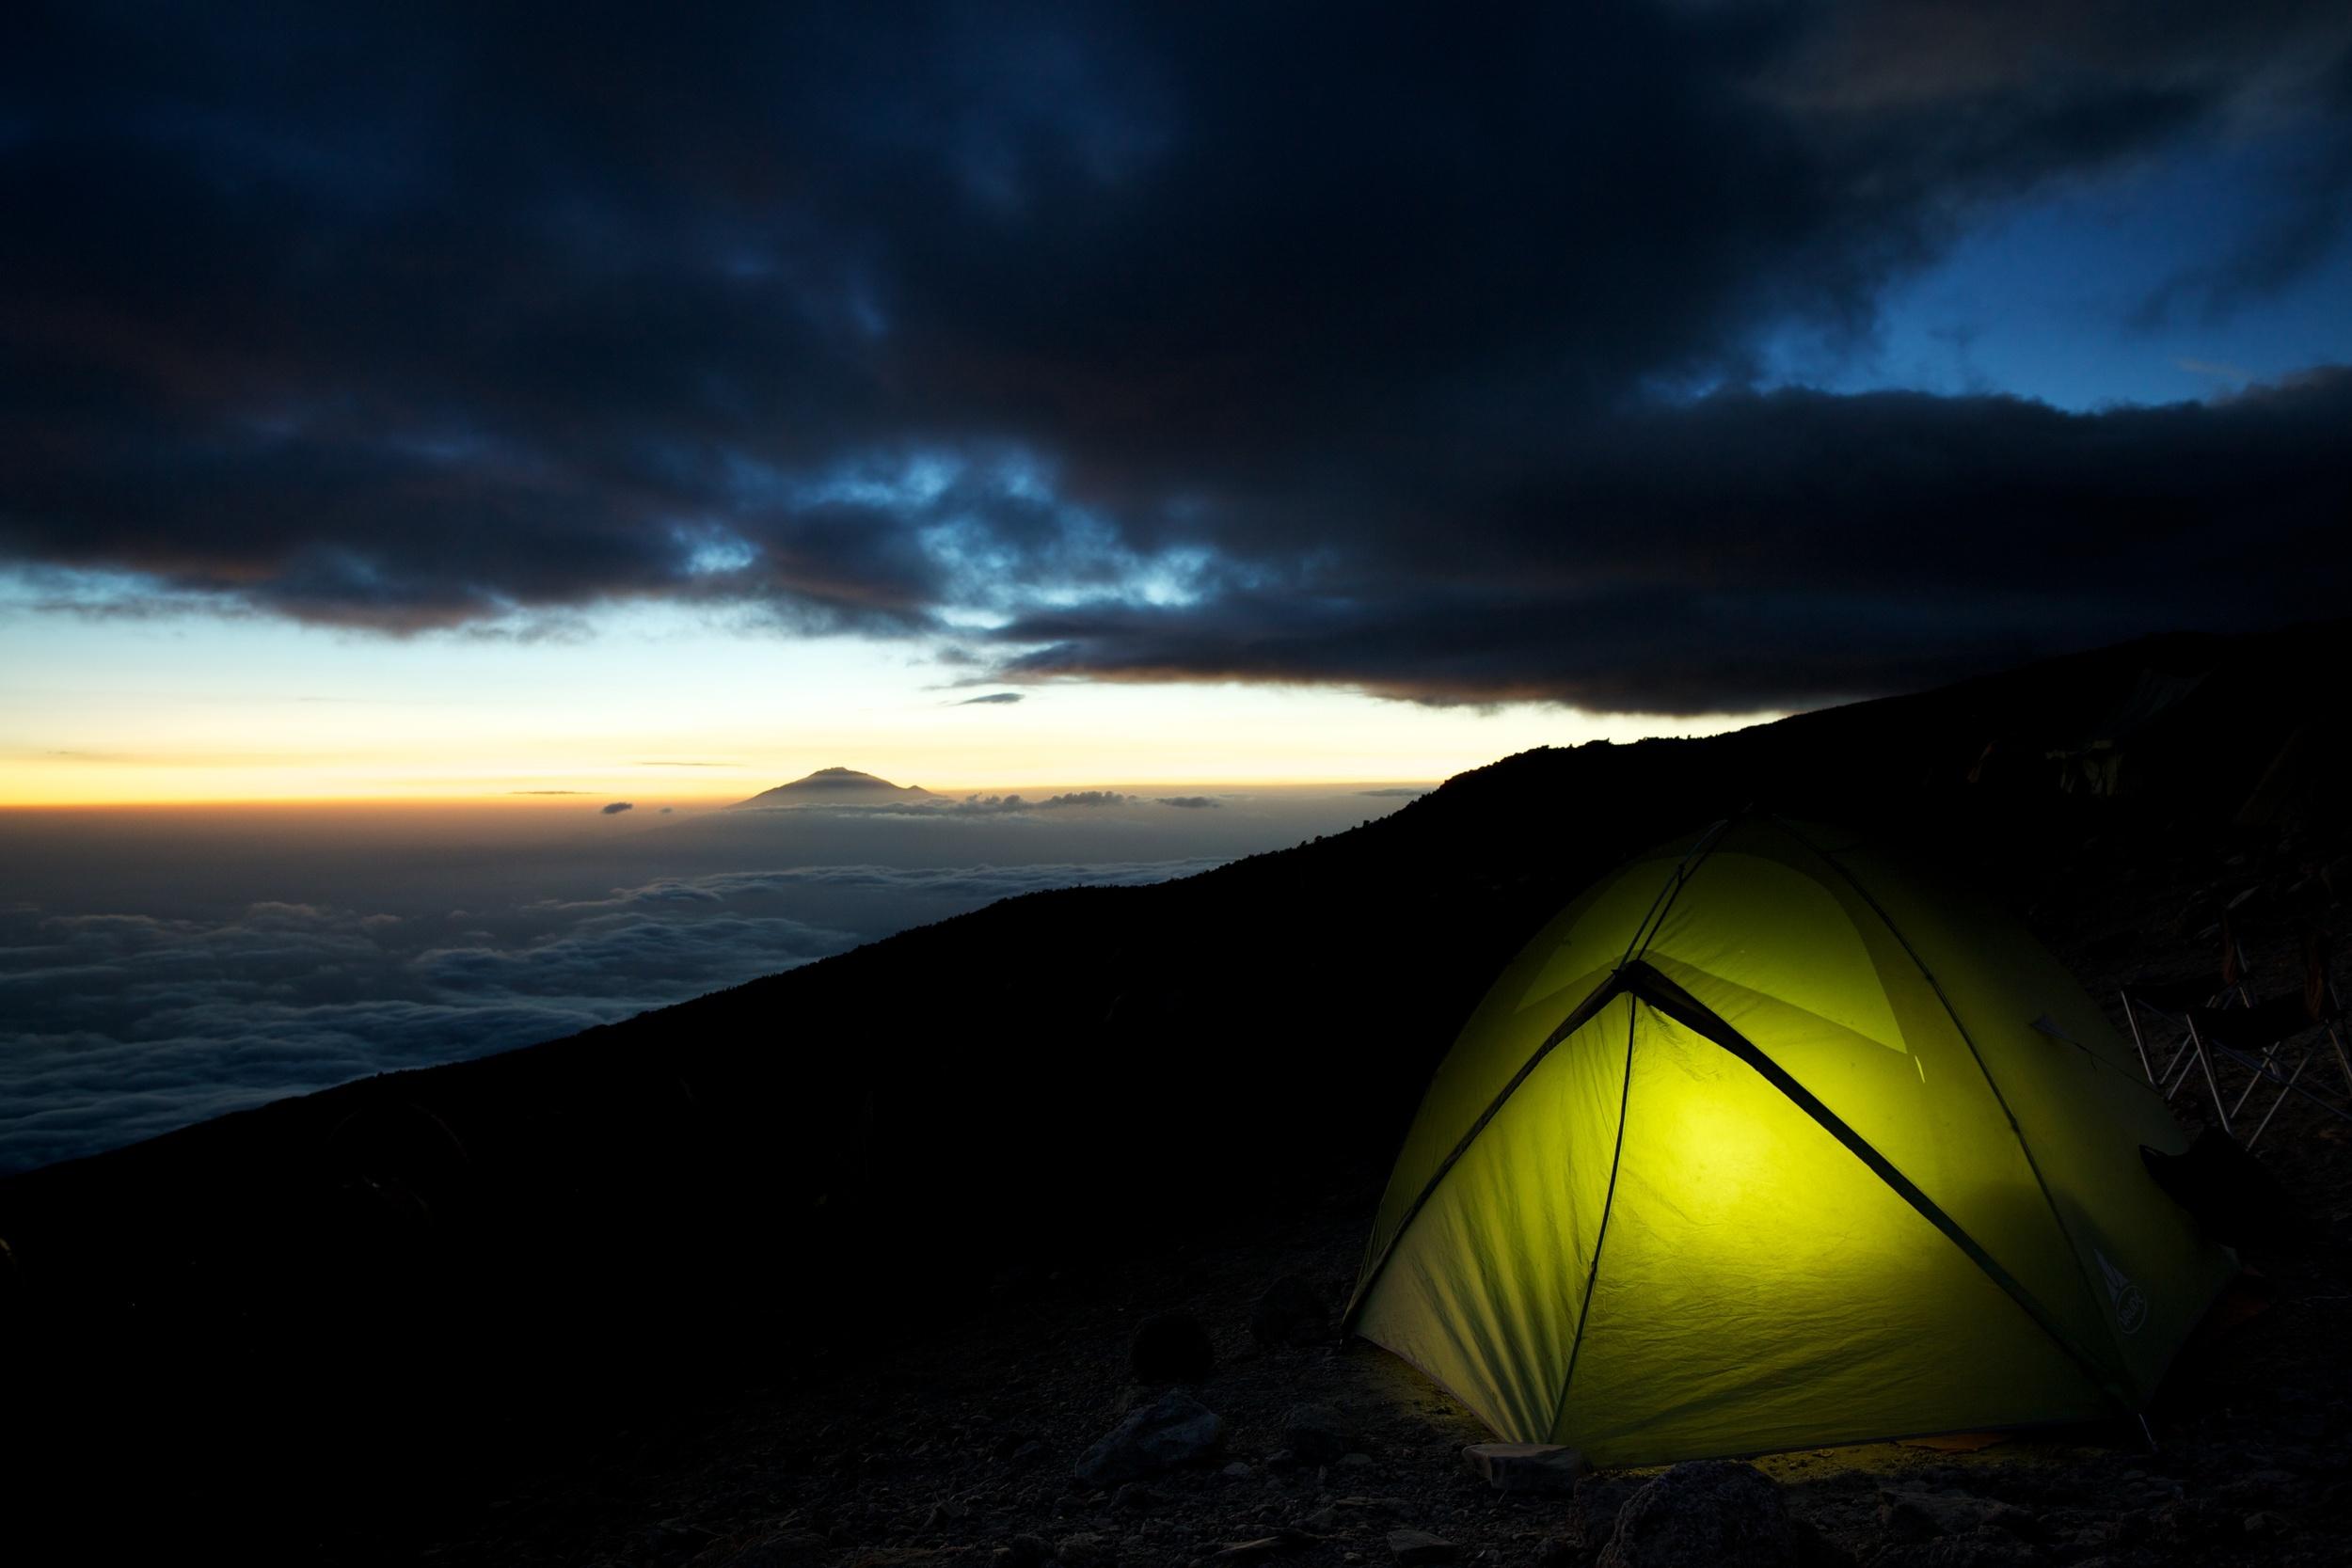 Twilight, Karanga Camp, Mt. Kilimanjaro (TZ)